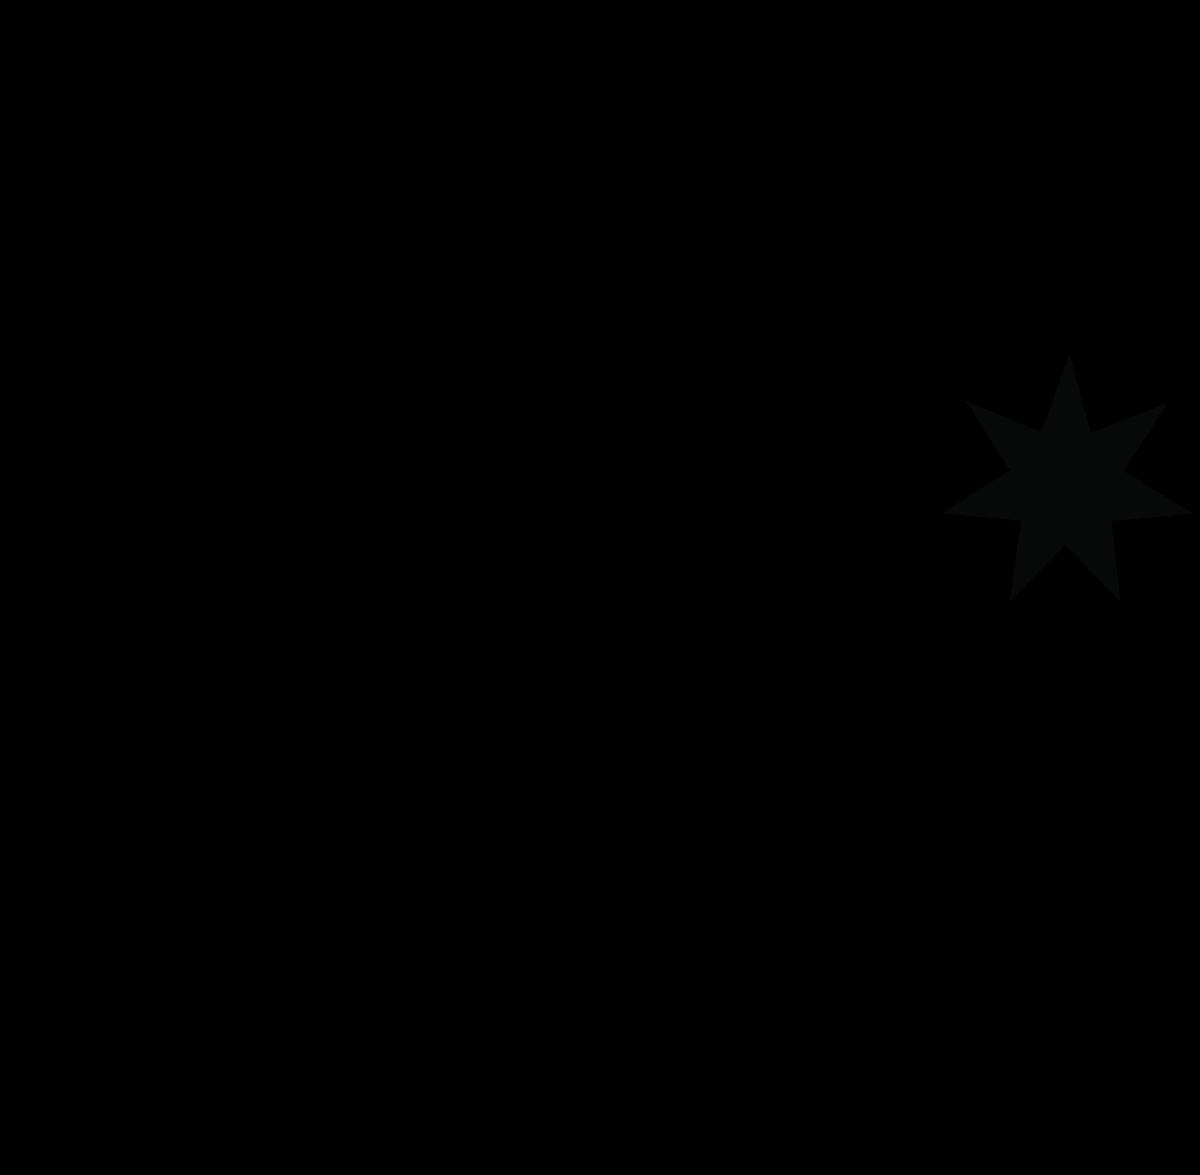 DC Shoe Co monogram logo